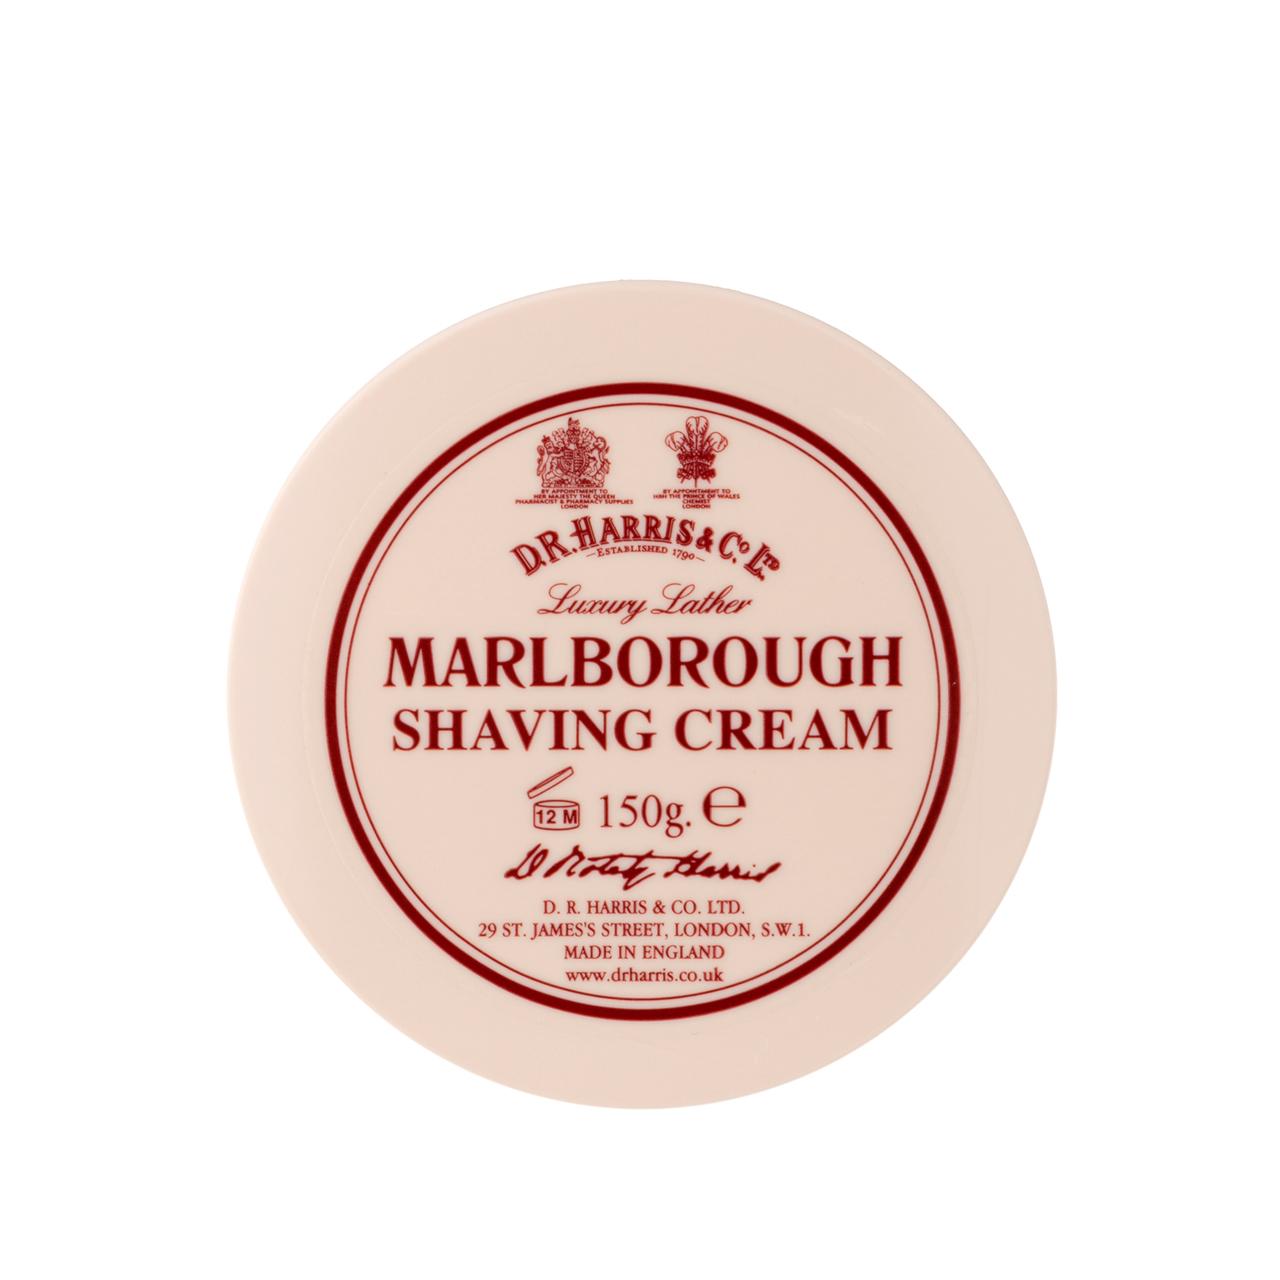 Marlborough - Shaving Cream Bowl